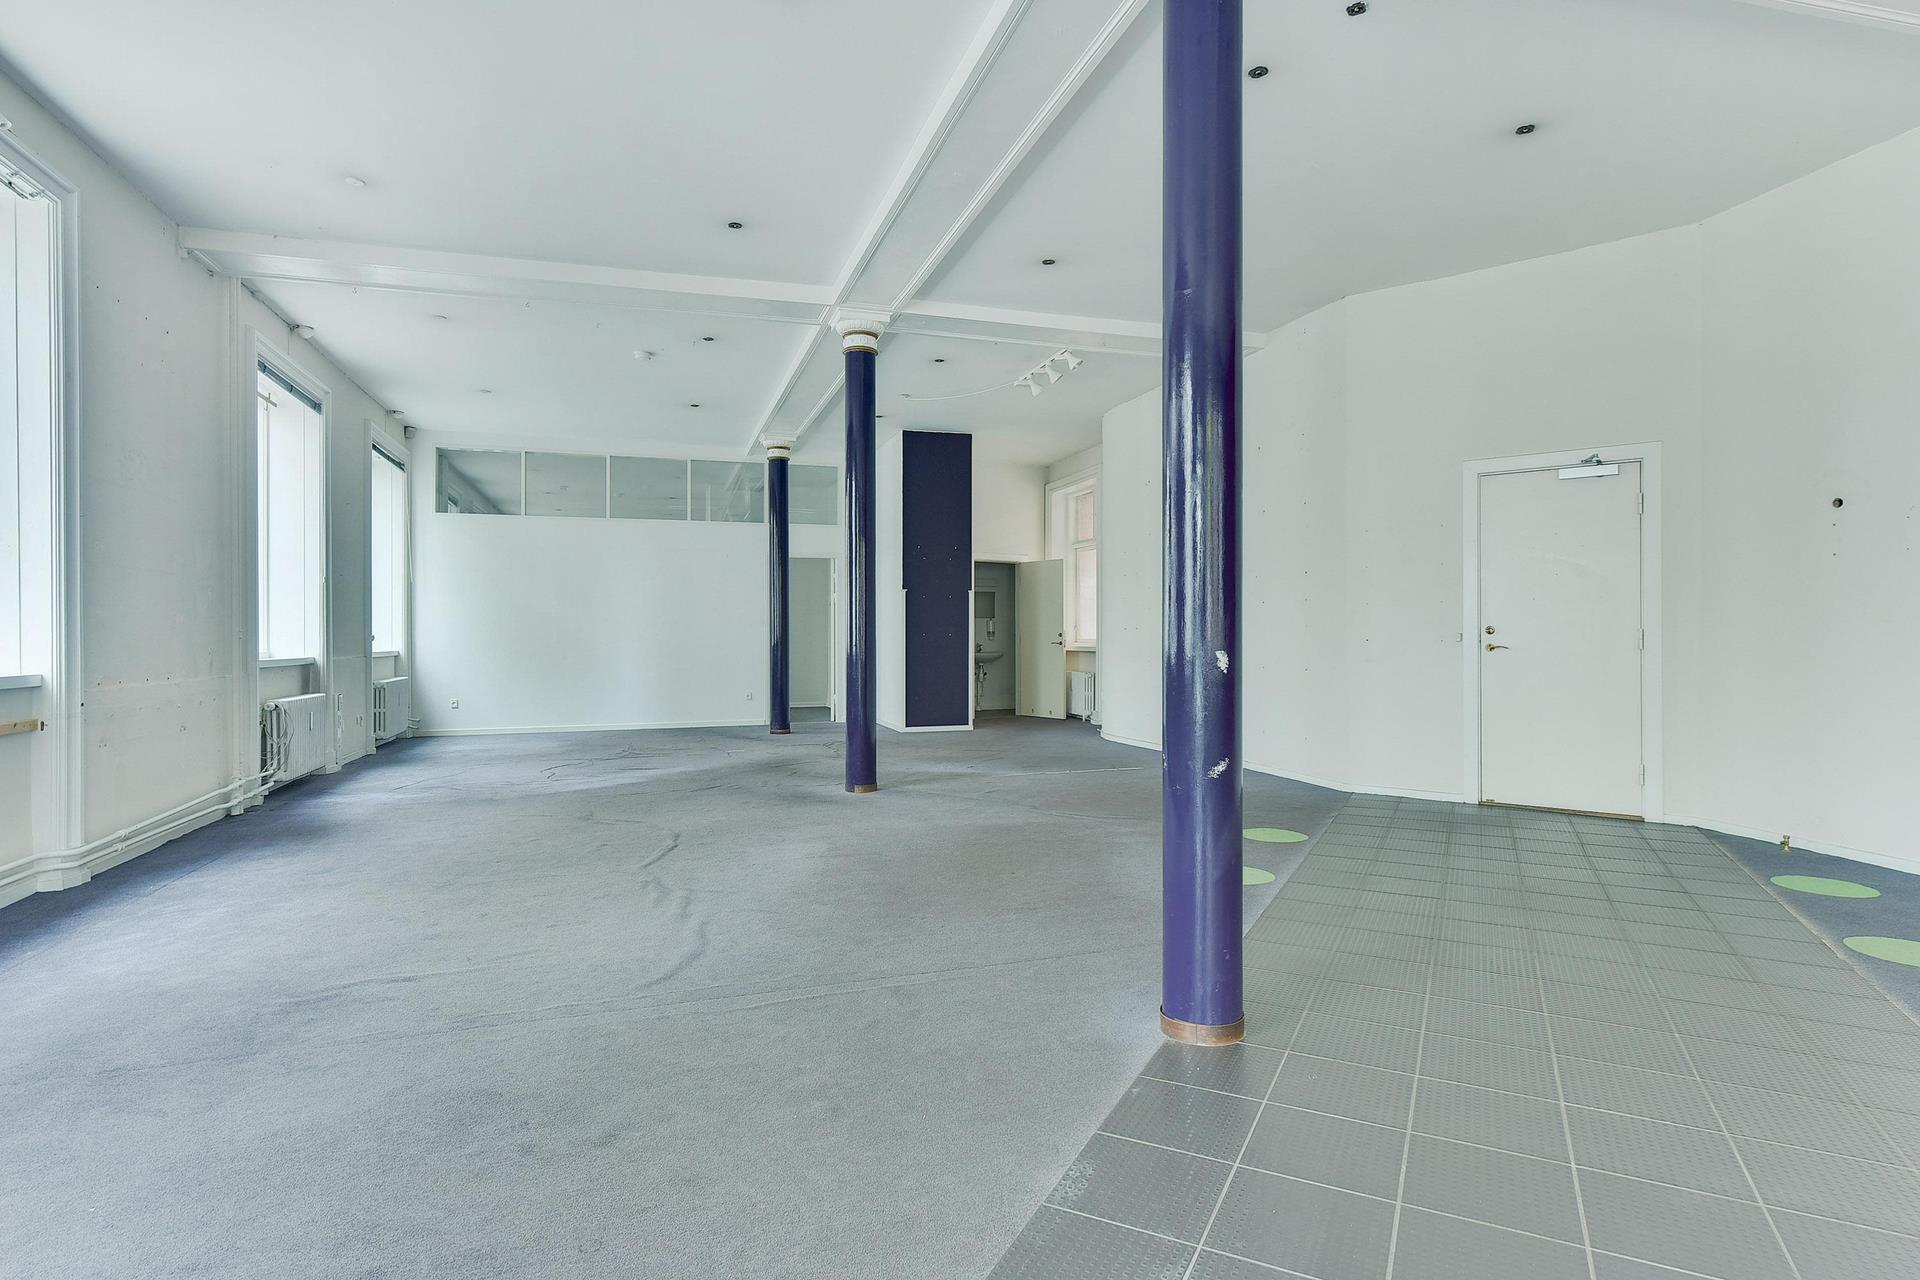 Bolig/erhverv på Akseltorv i Kolding - Kontor